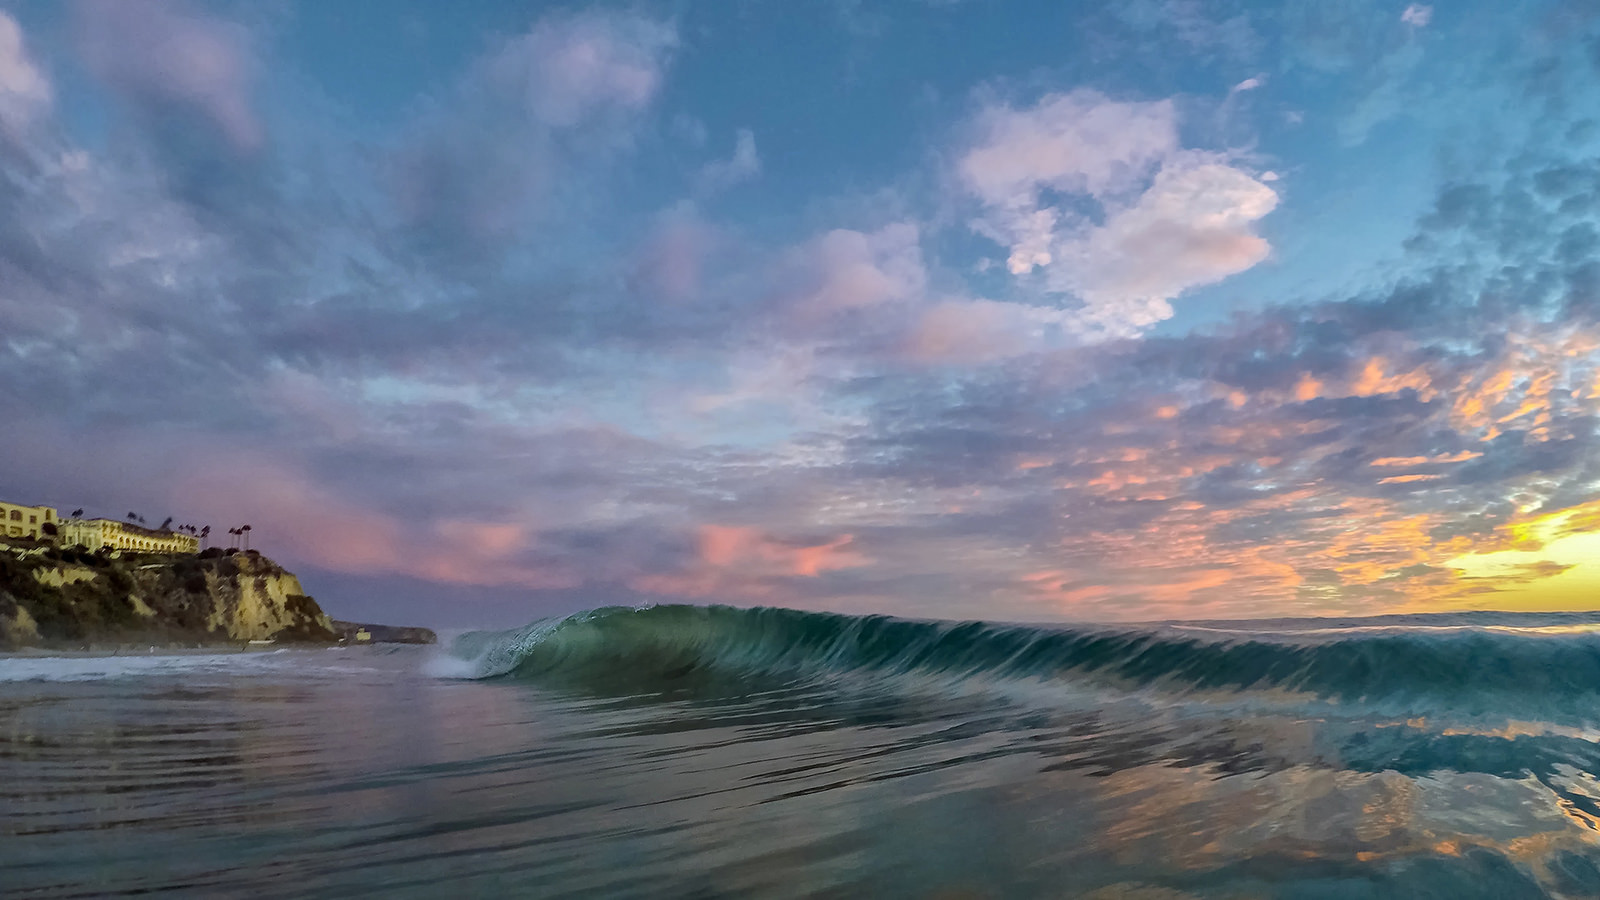 Las olas al atardecer - 1600x900